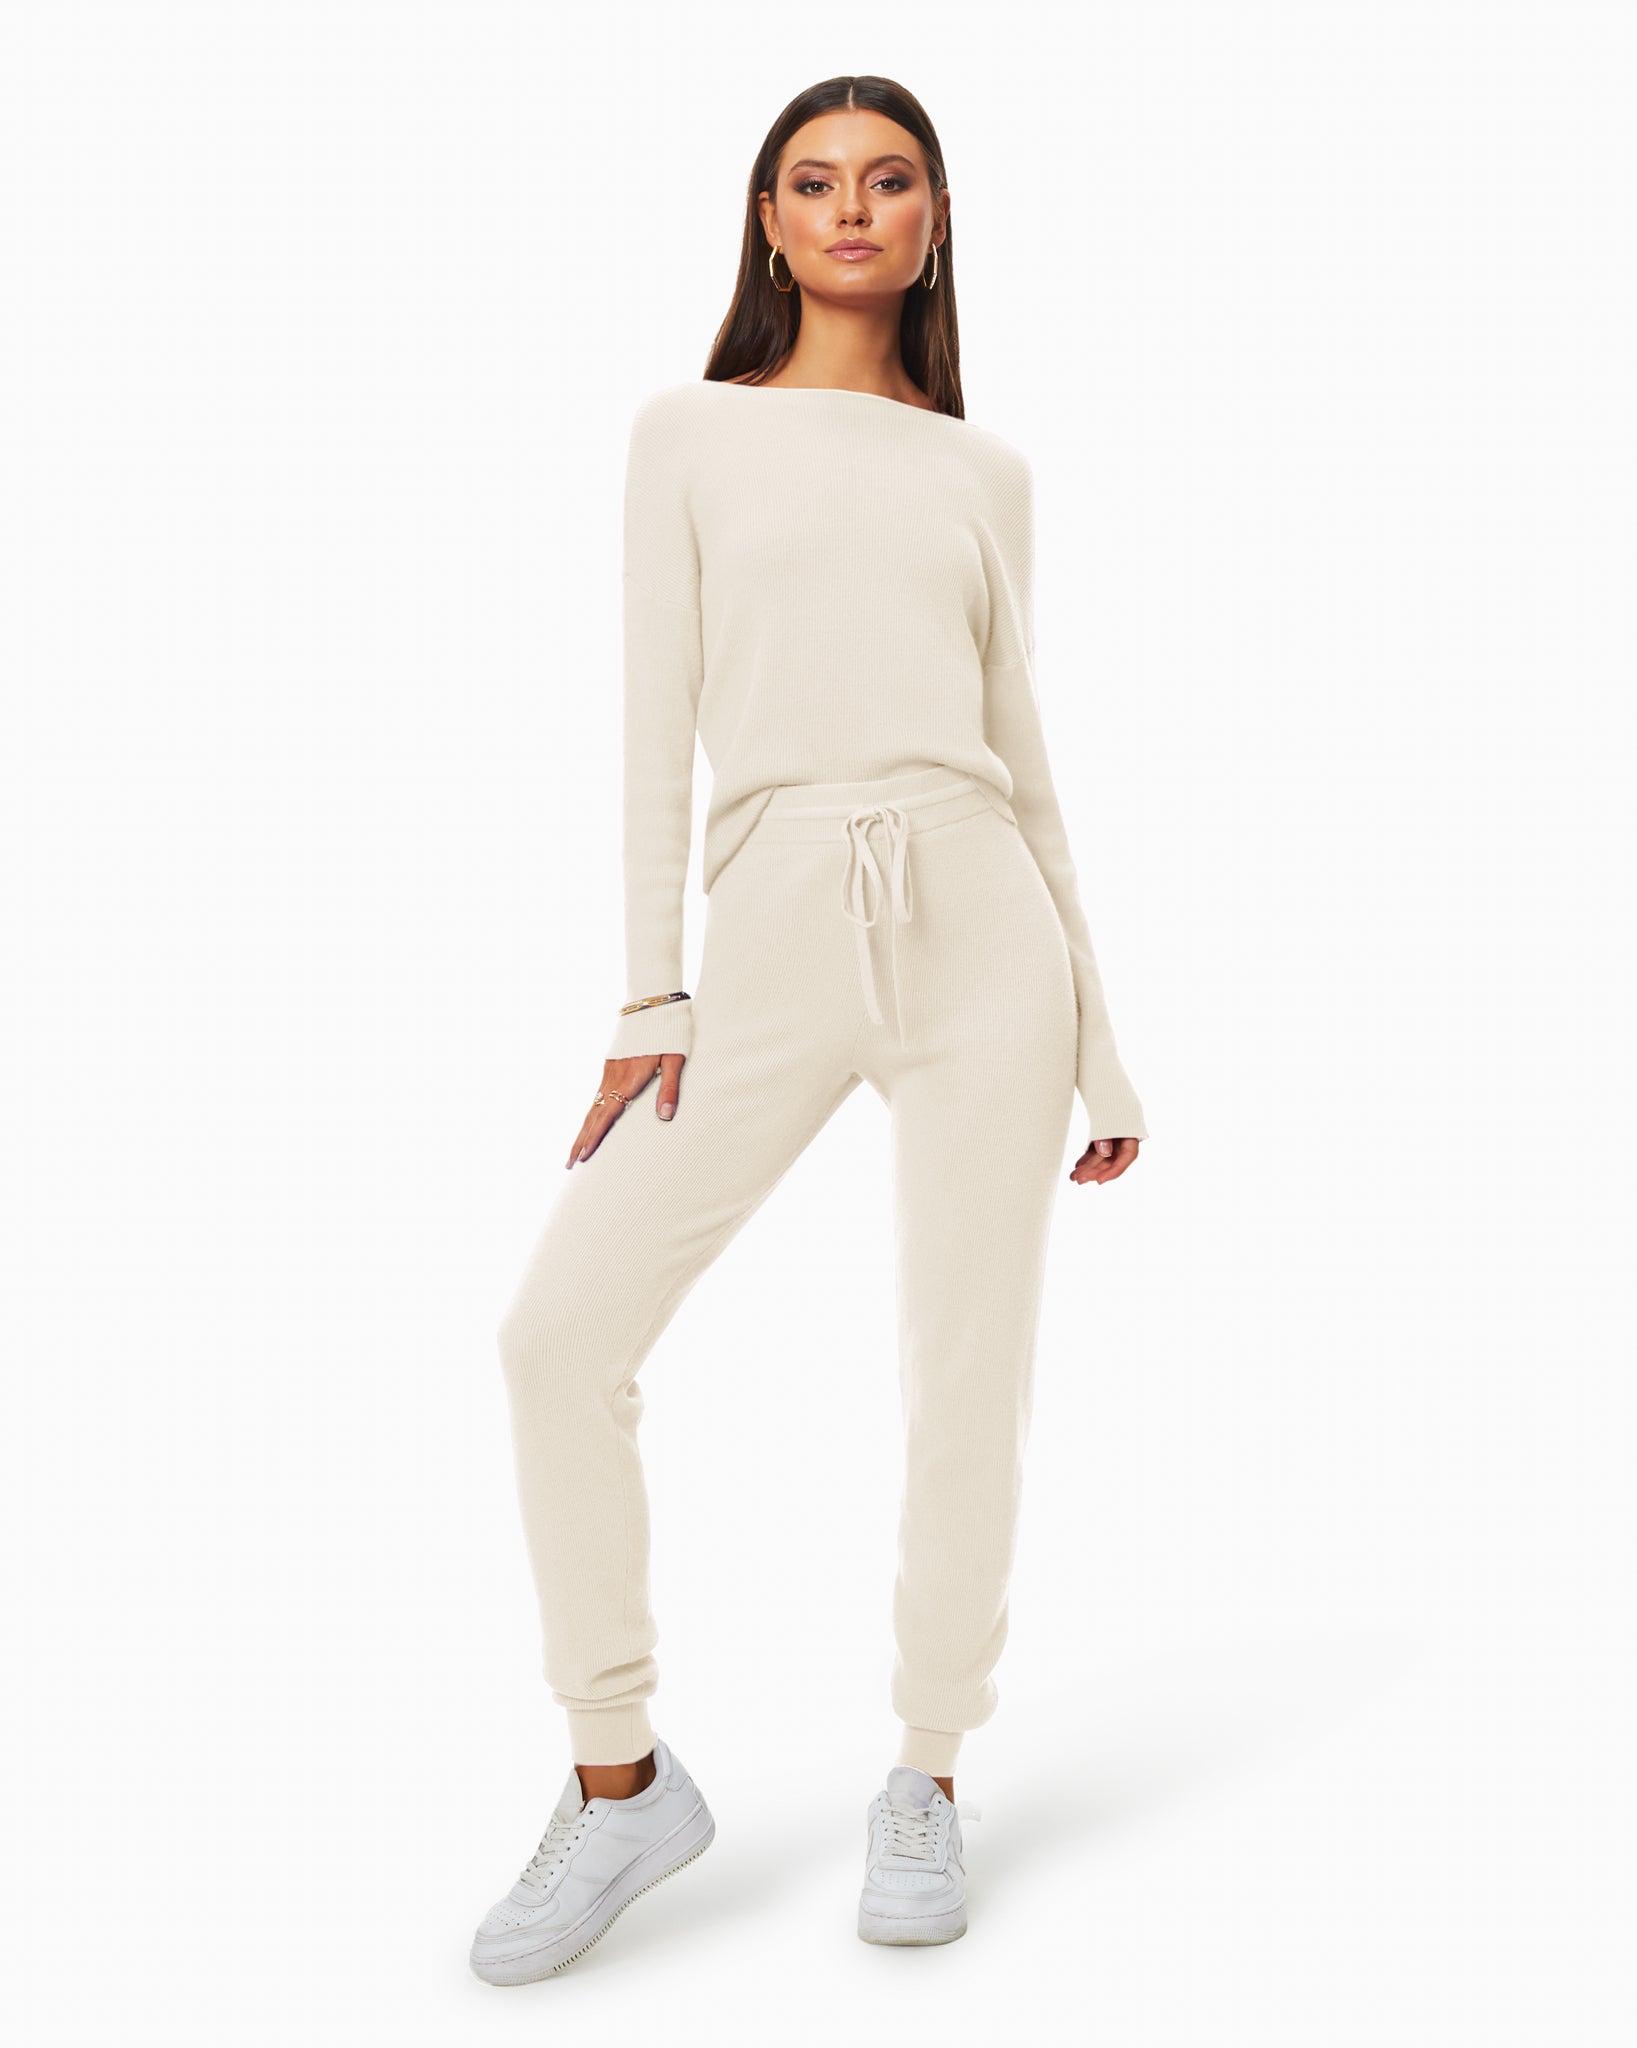 Landon Knit Jogger in Cream - Cream - Size: XL